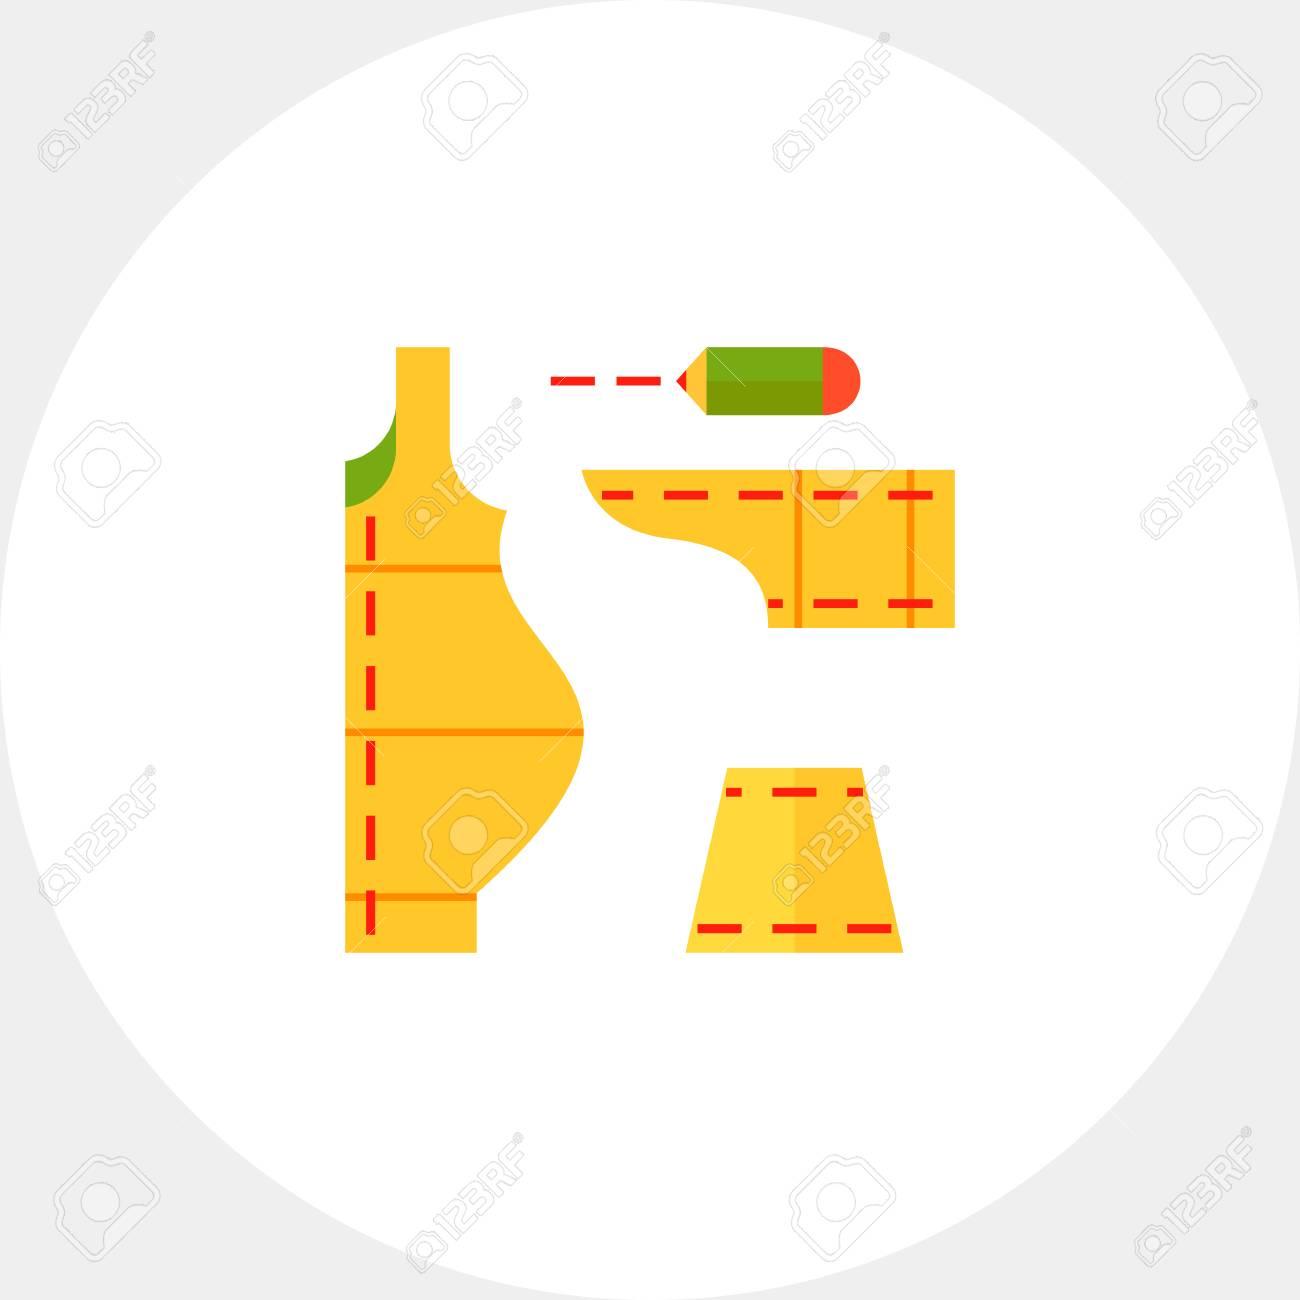 Ziemlich Nähmuster Symbole Ideen - Nähmuster-Ideen - sarasara.info